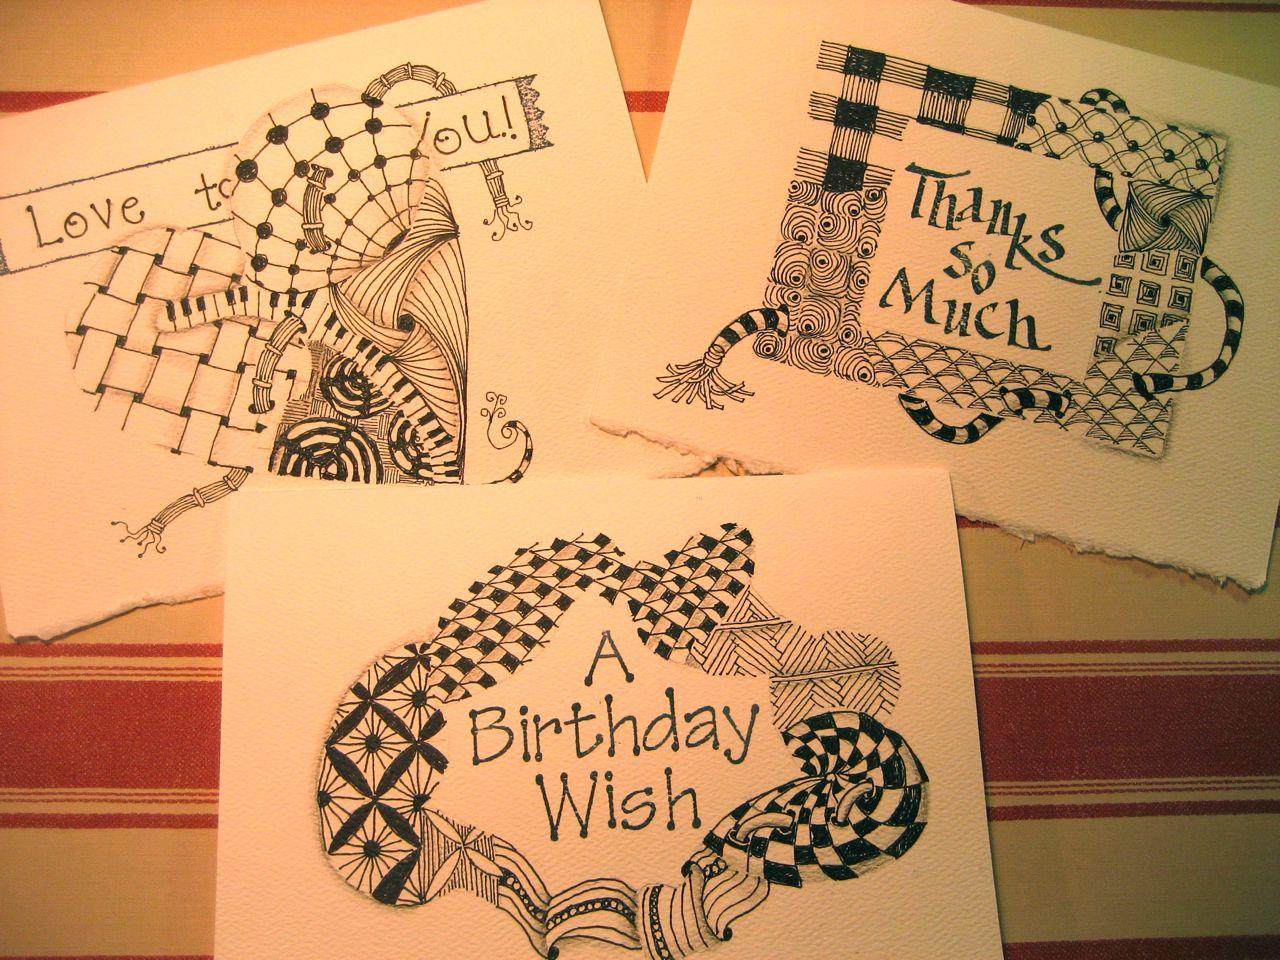 an artist labyrinth ginny stiles czt zentangle greeting cards